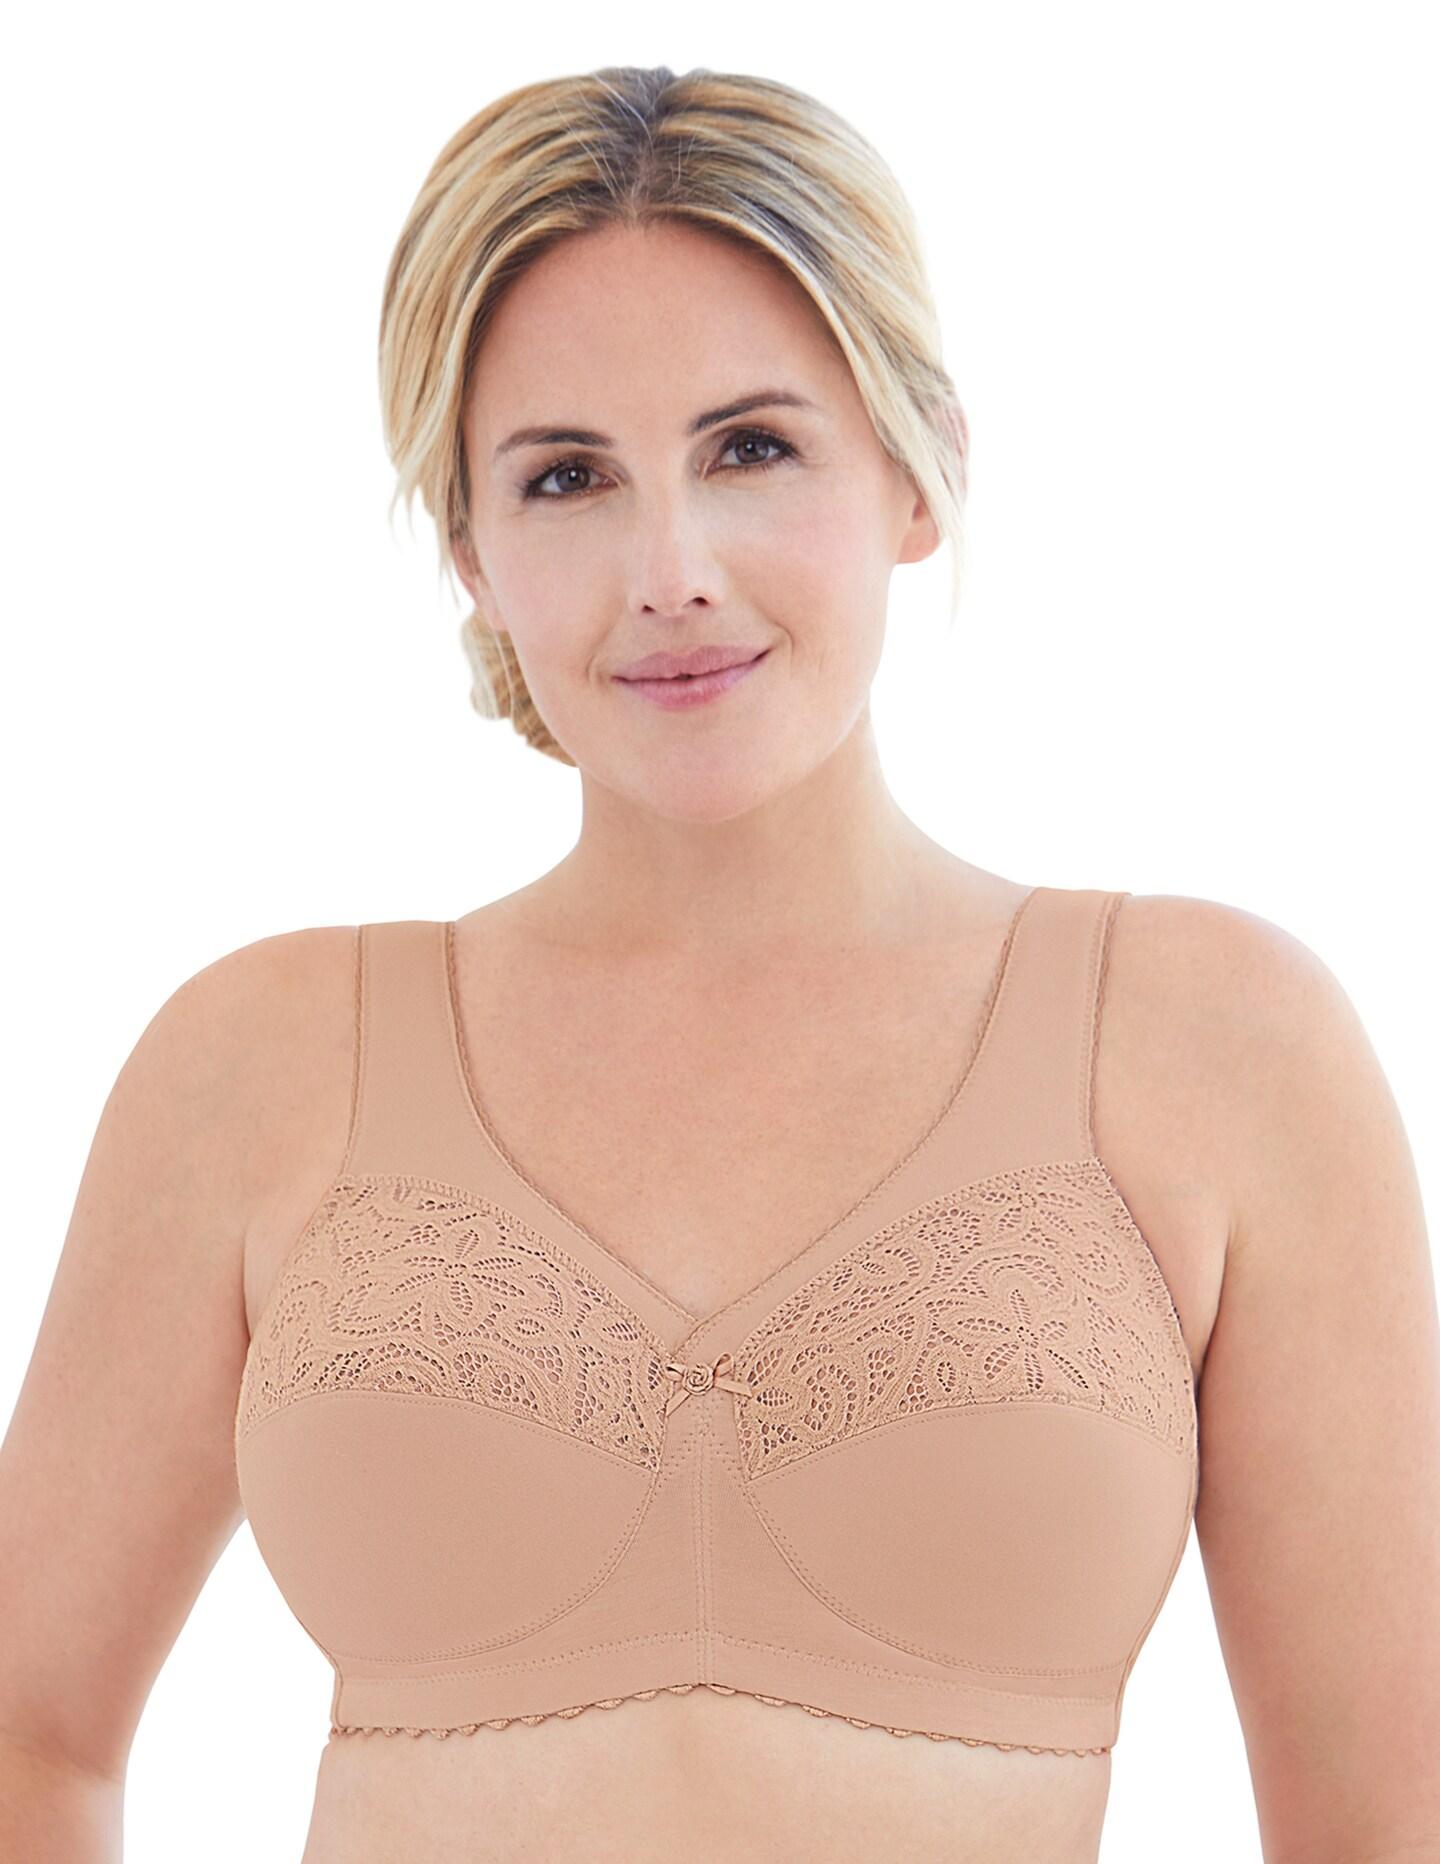 Glamorise Plus Size MagicLift Cotton Support Bra 1001